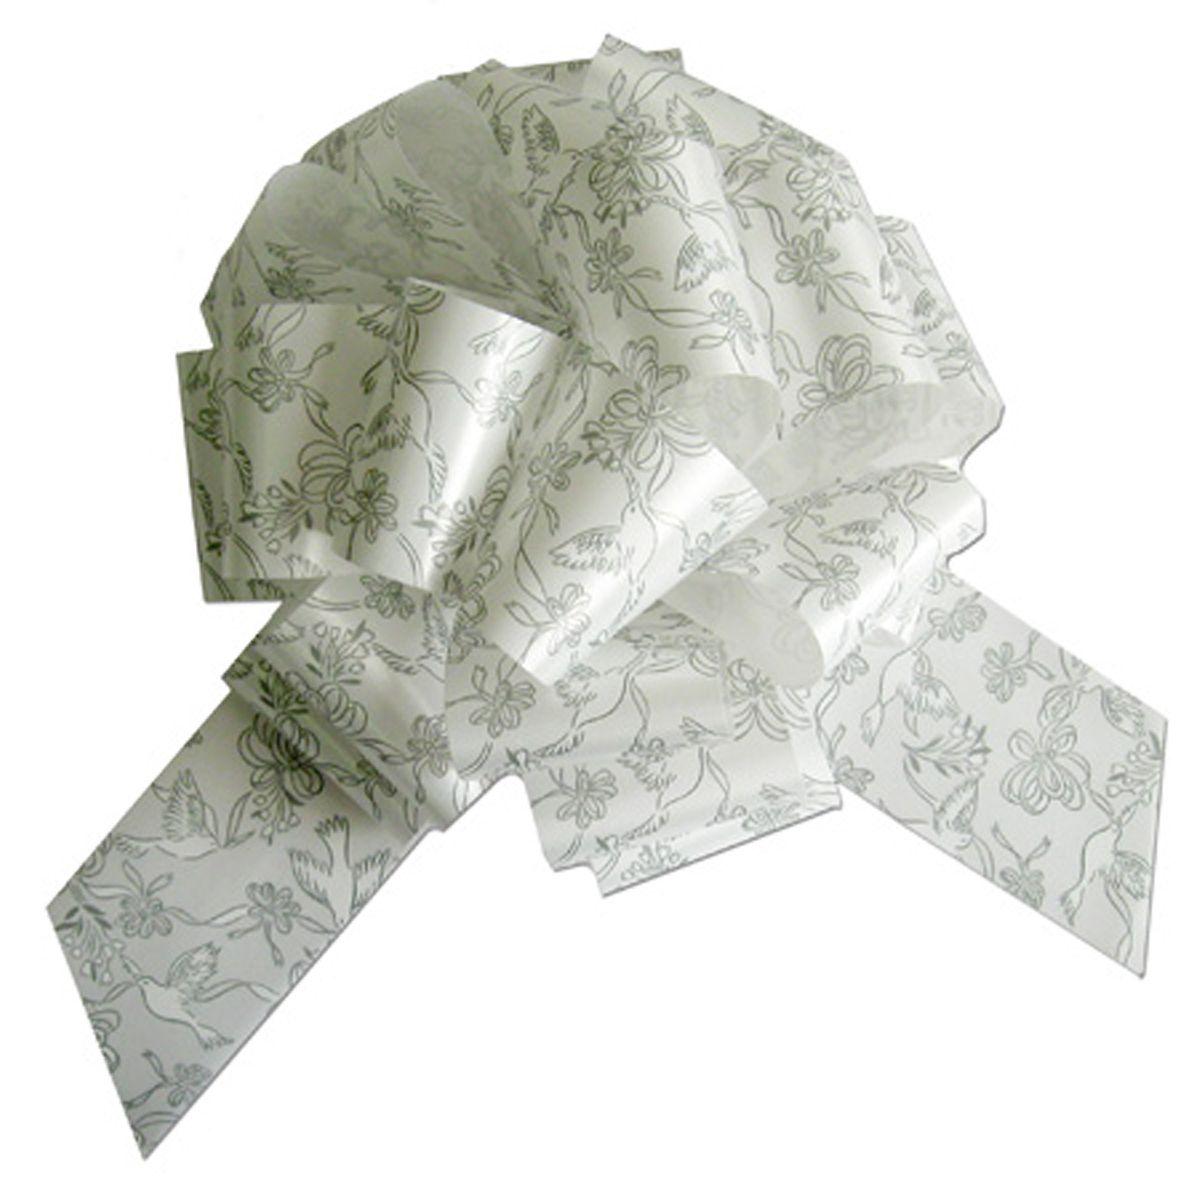 "Wedding Dove #Bow 8"" (White/Silver) Perfect Bow #perfectbow #weddingbow #silverandwhite #wedding #weddingpackaging #weddingsupplies #weddingdove  https://www.midatlanticpackaging.com/Content/Images/Product/PPF4WSD.jpg"